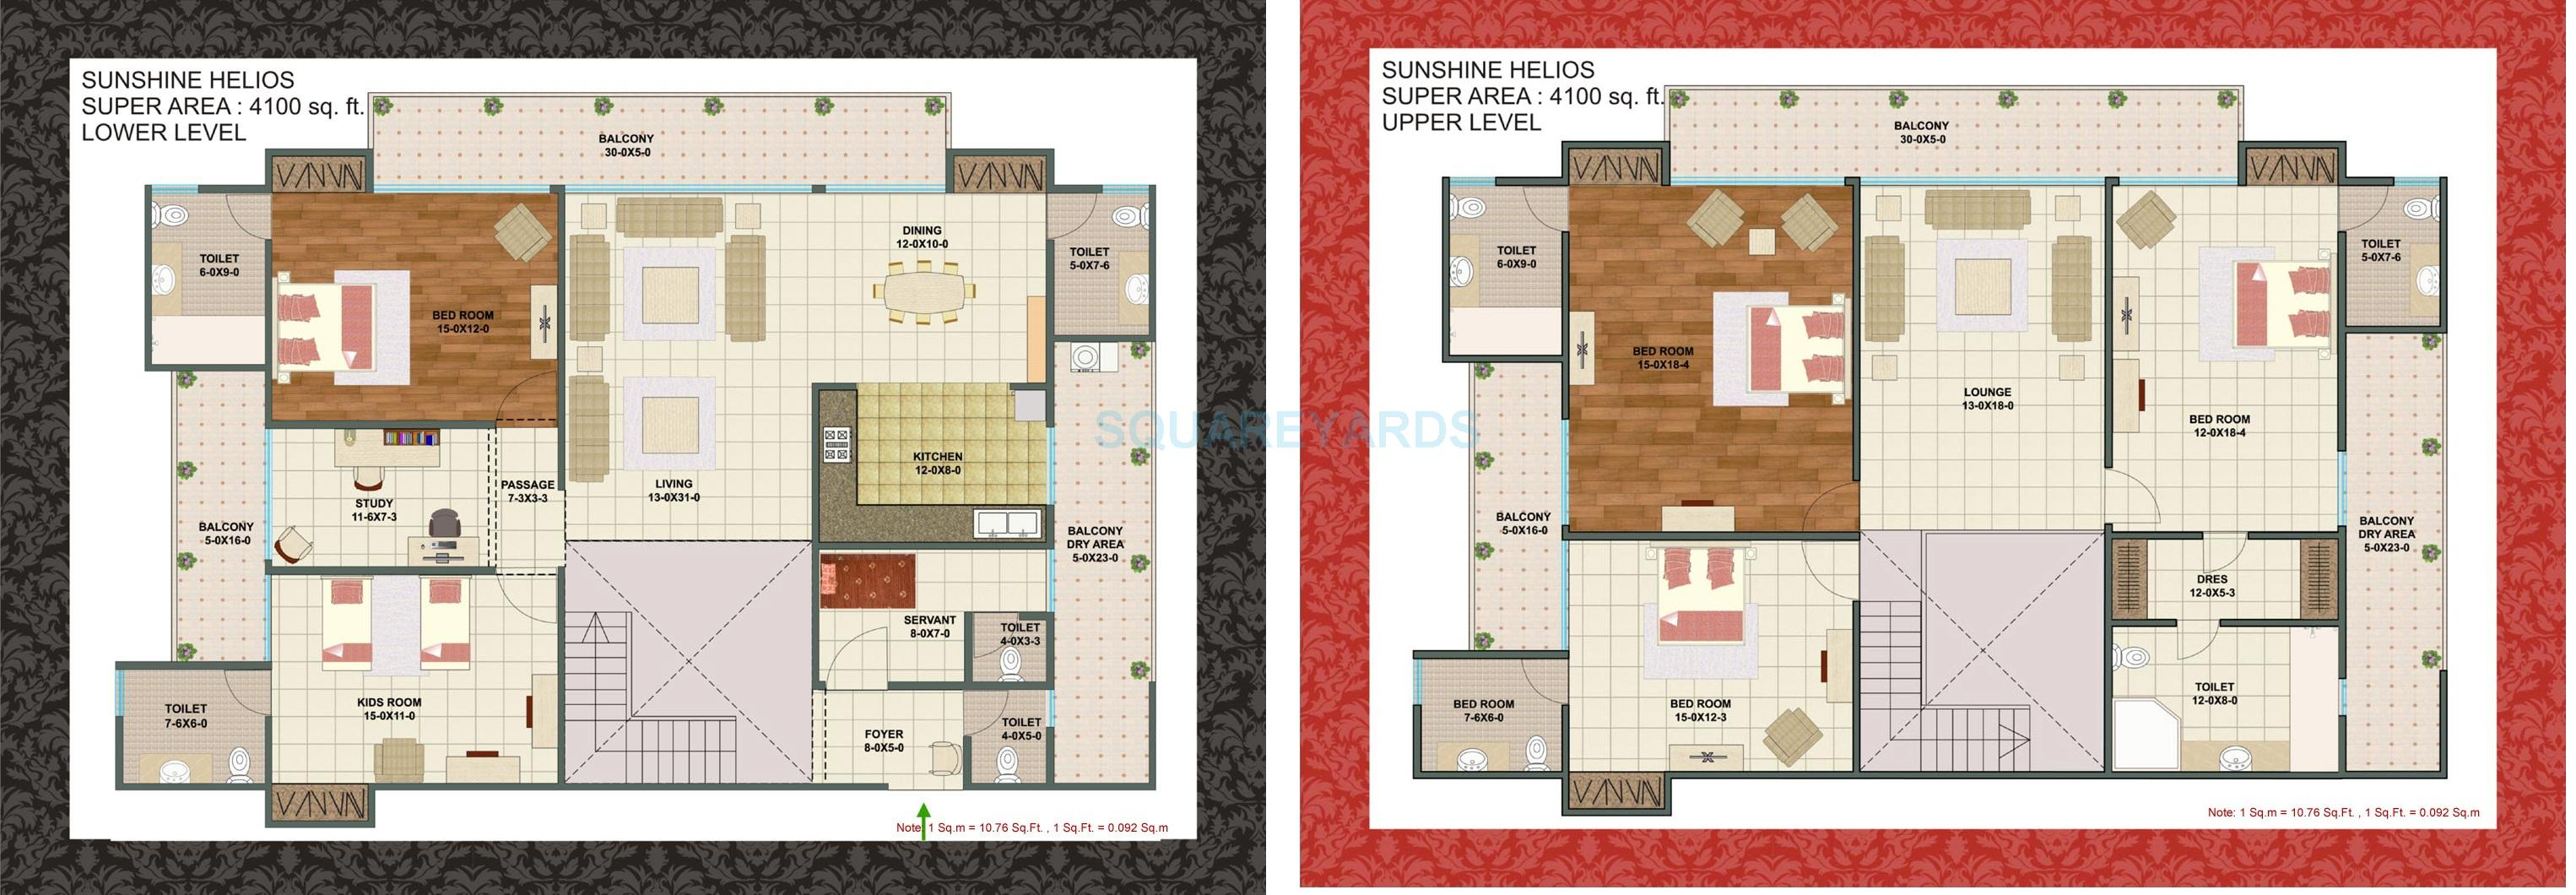 sunshine helios penthouse 5bhk 4100sqft 1